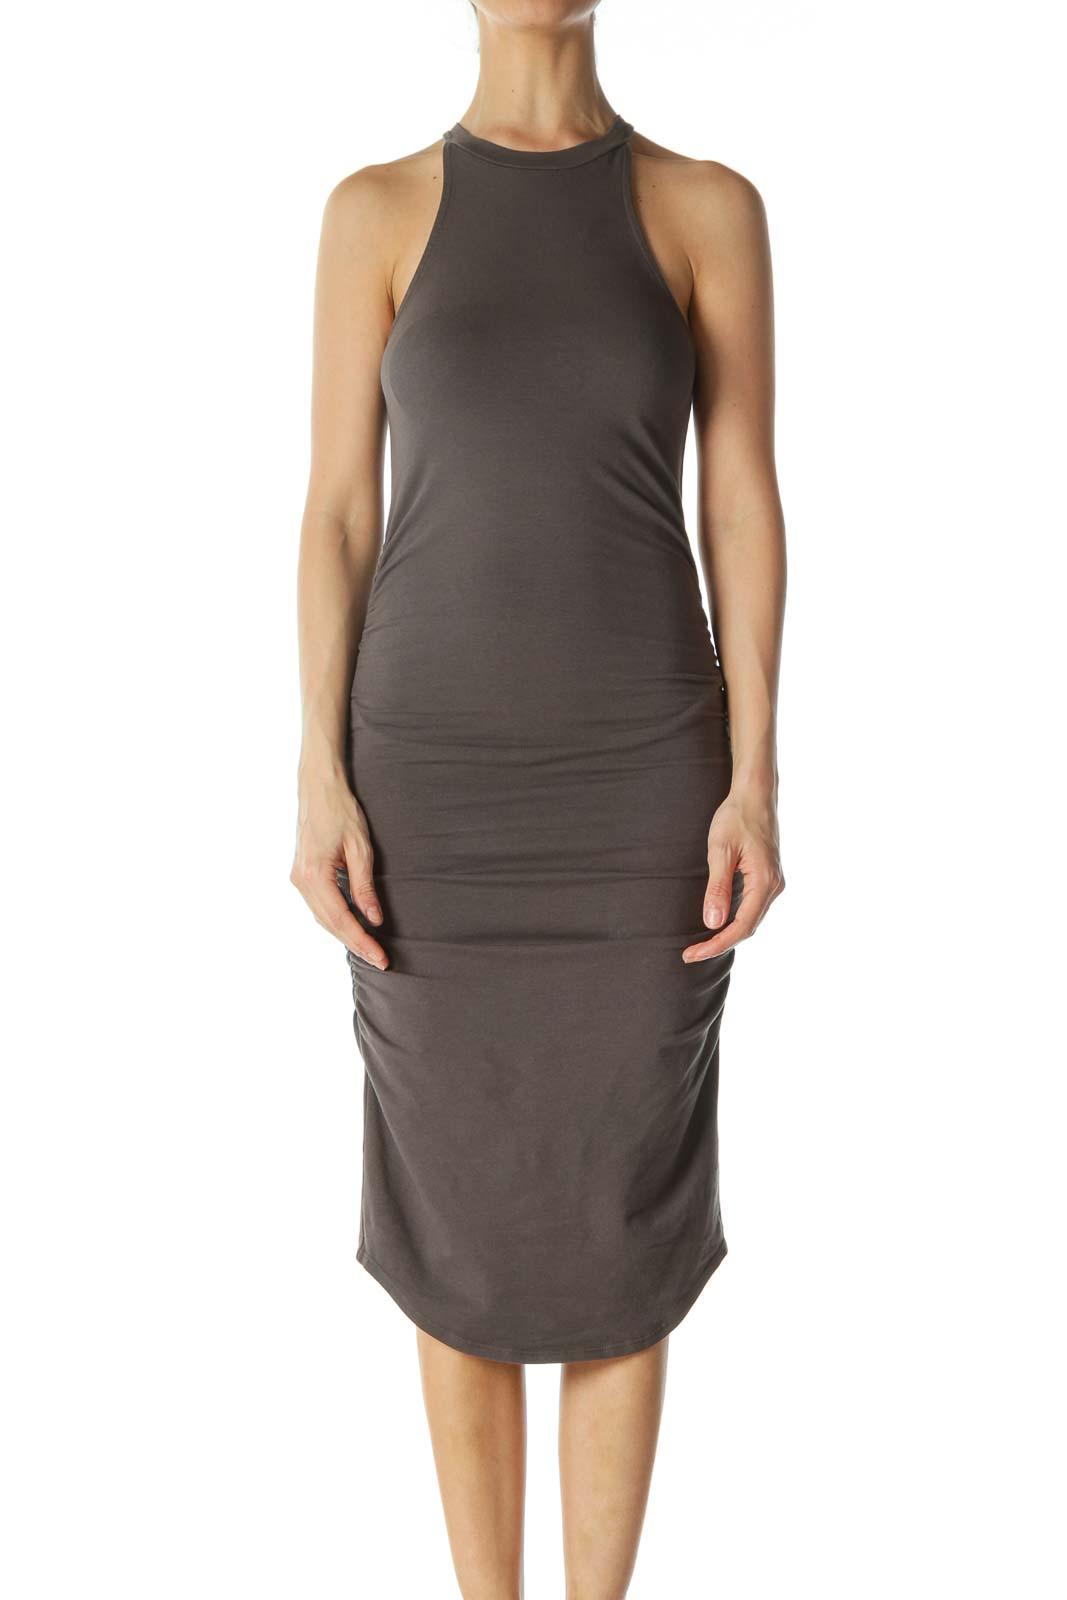 Charcoal High-Neck Racerback Bandage Dress